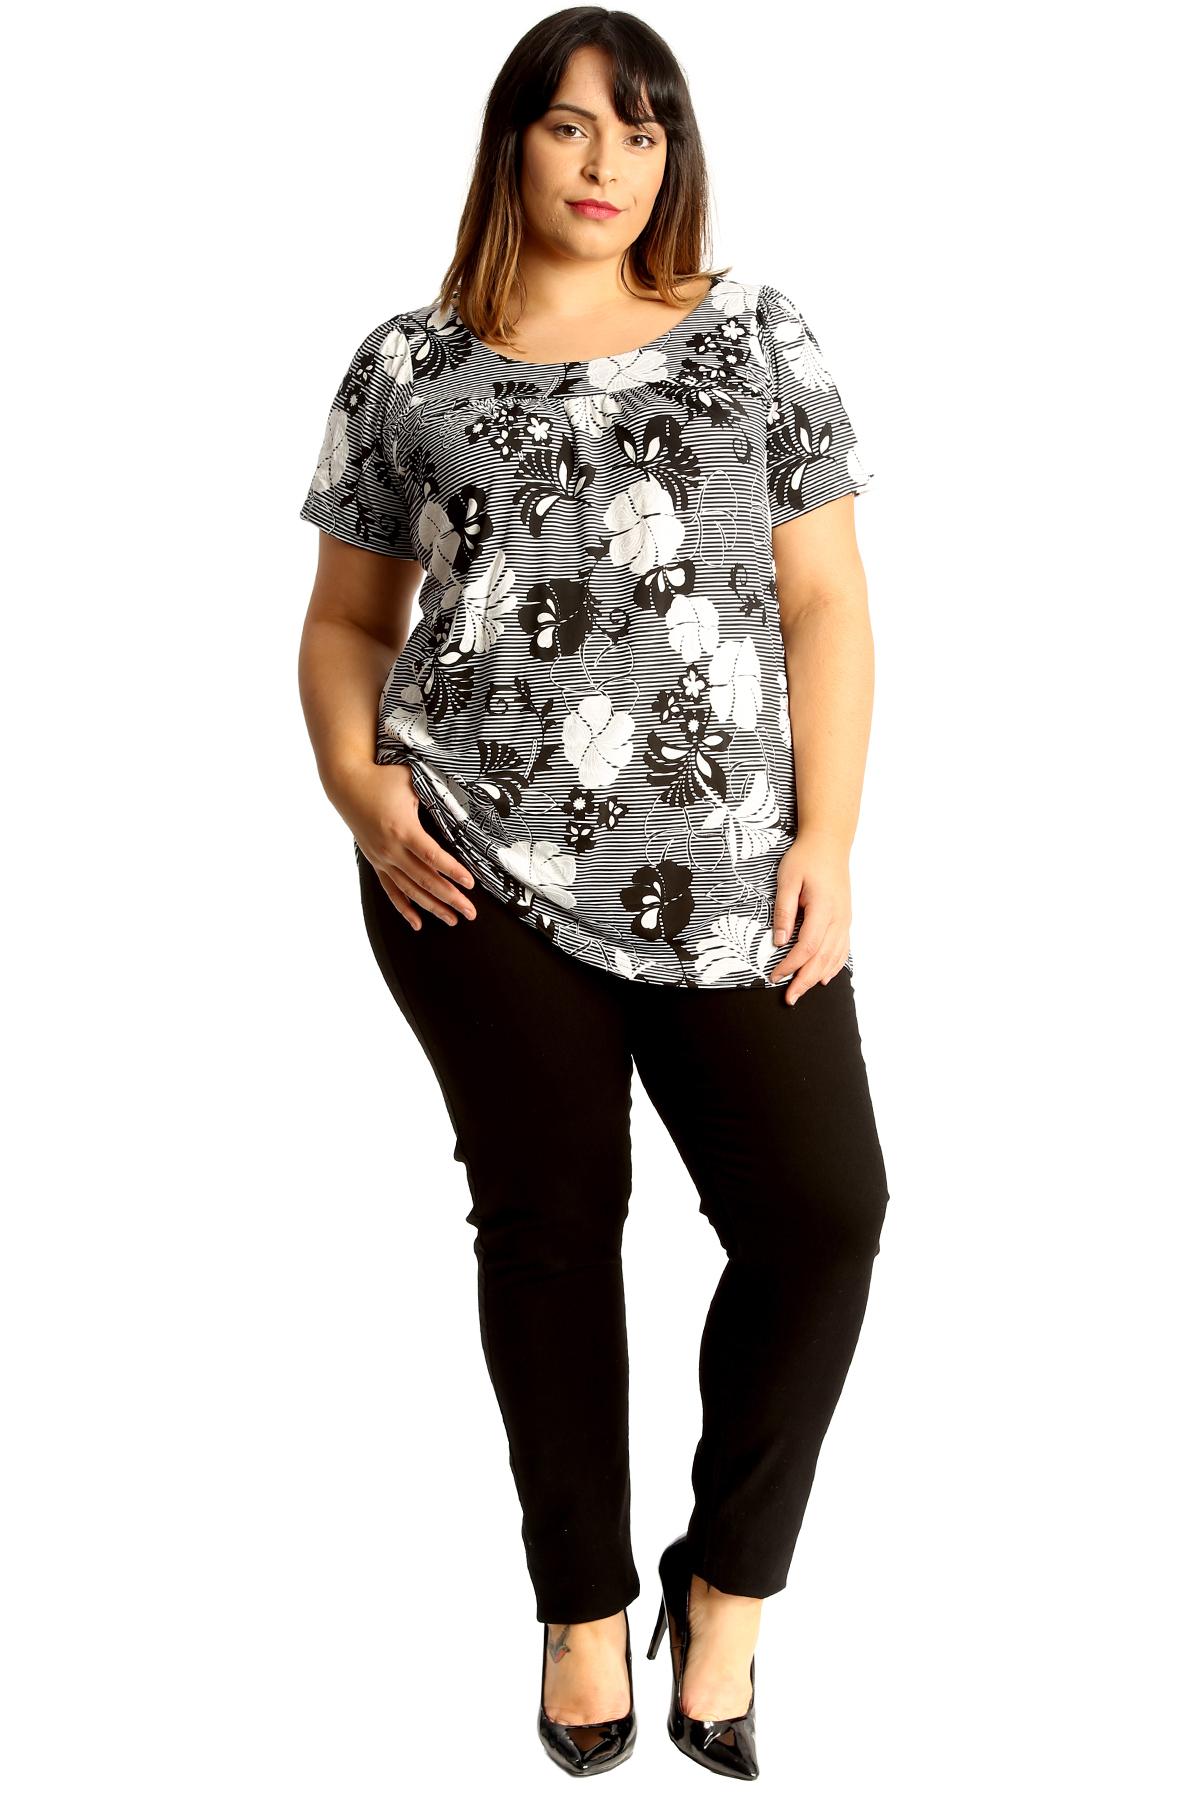 New Womens Plus Size Smock Top Ladies Monochrome Floral Print Tunic Blouse Round